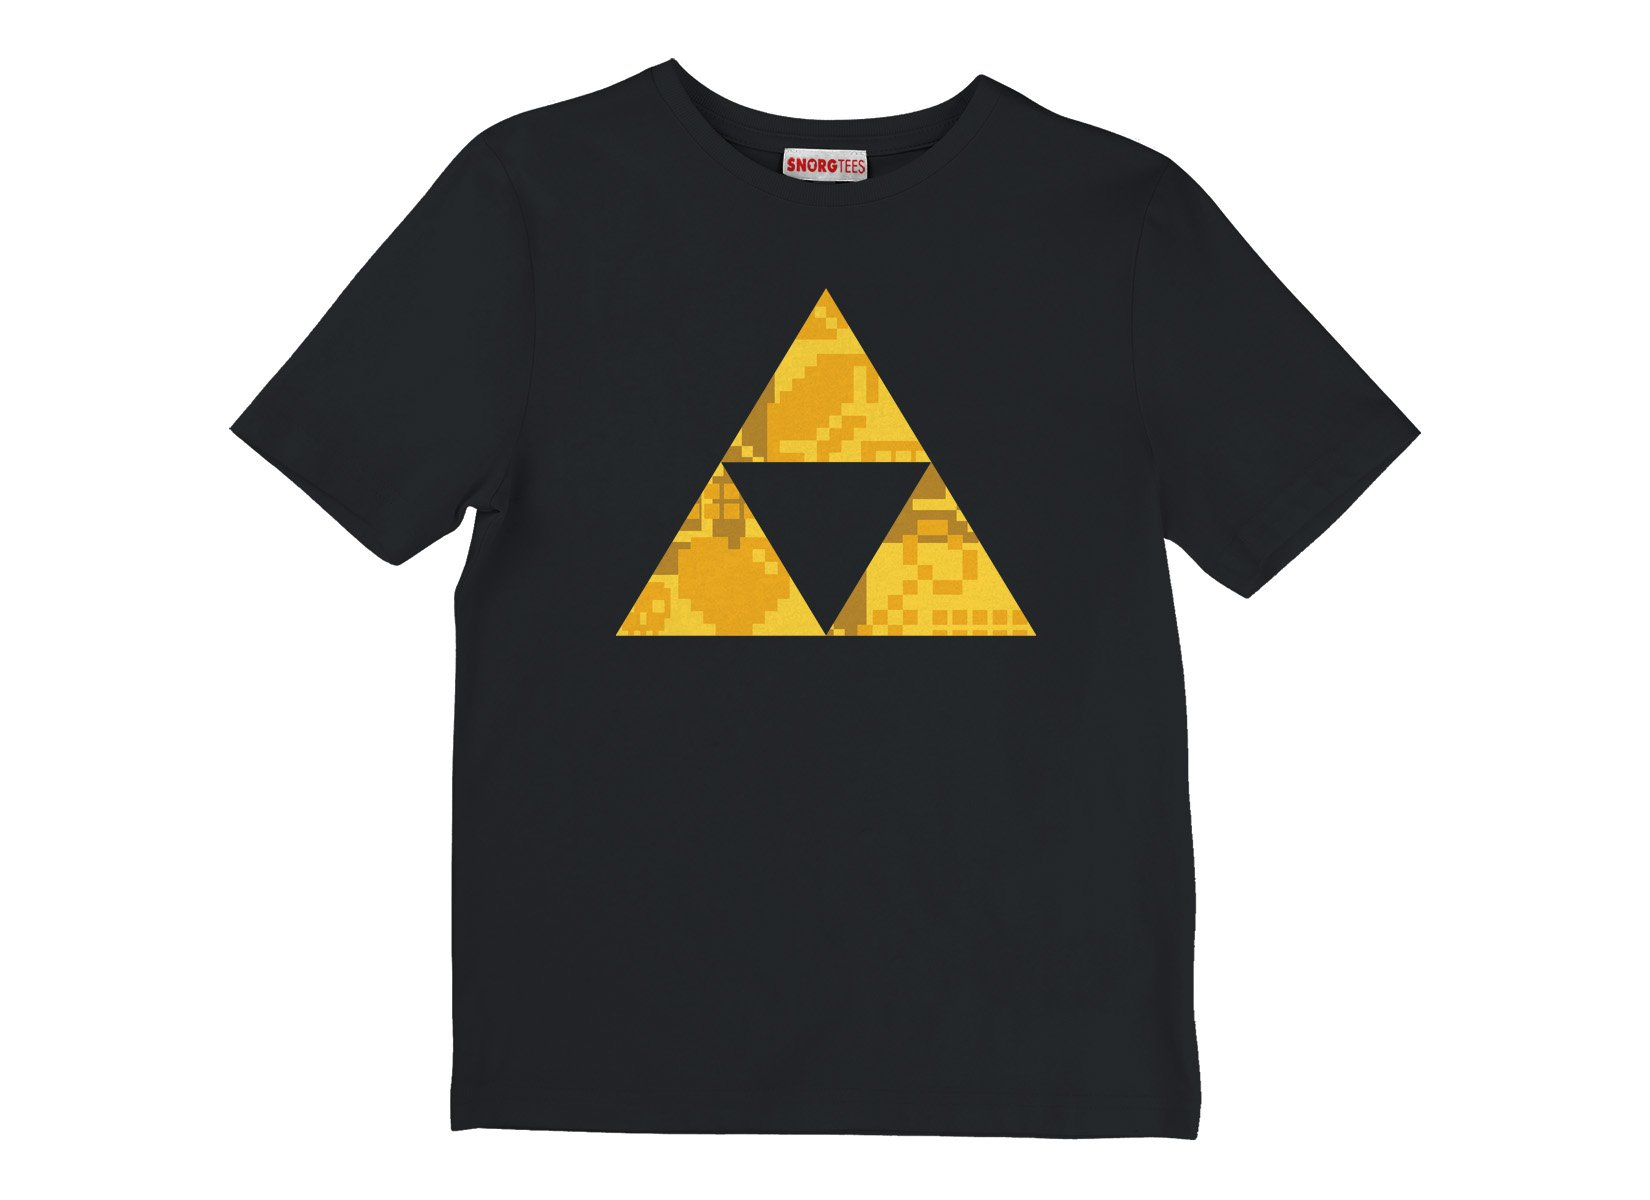 Triforce on Kids T-Shirt